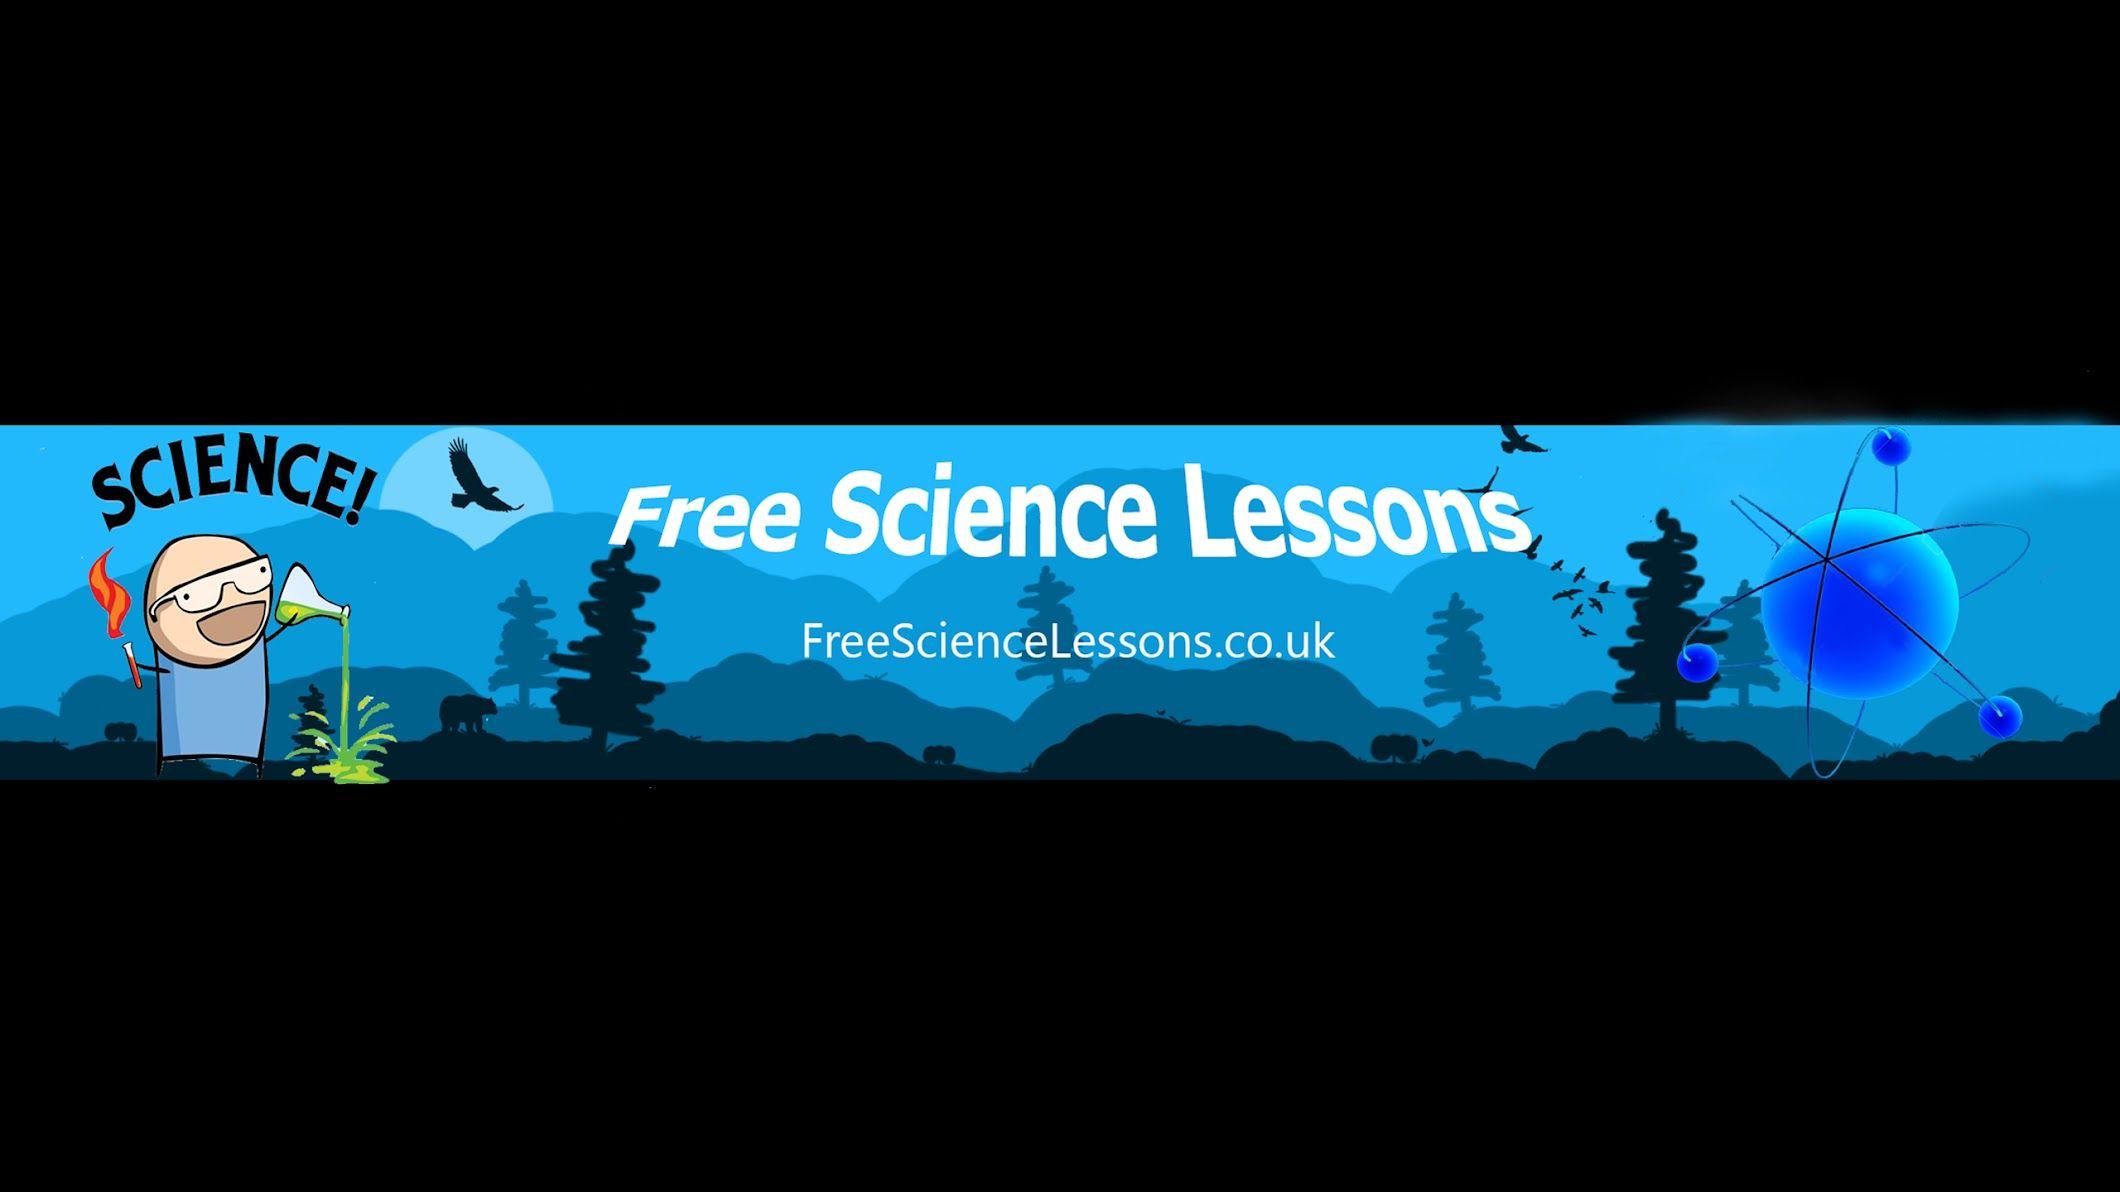 Freesciencelessons